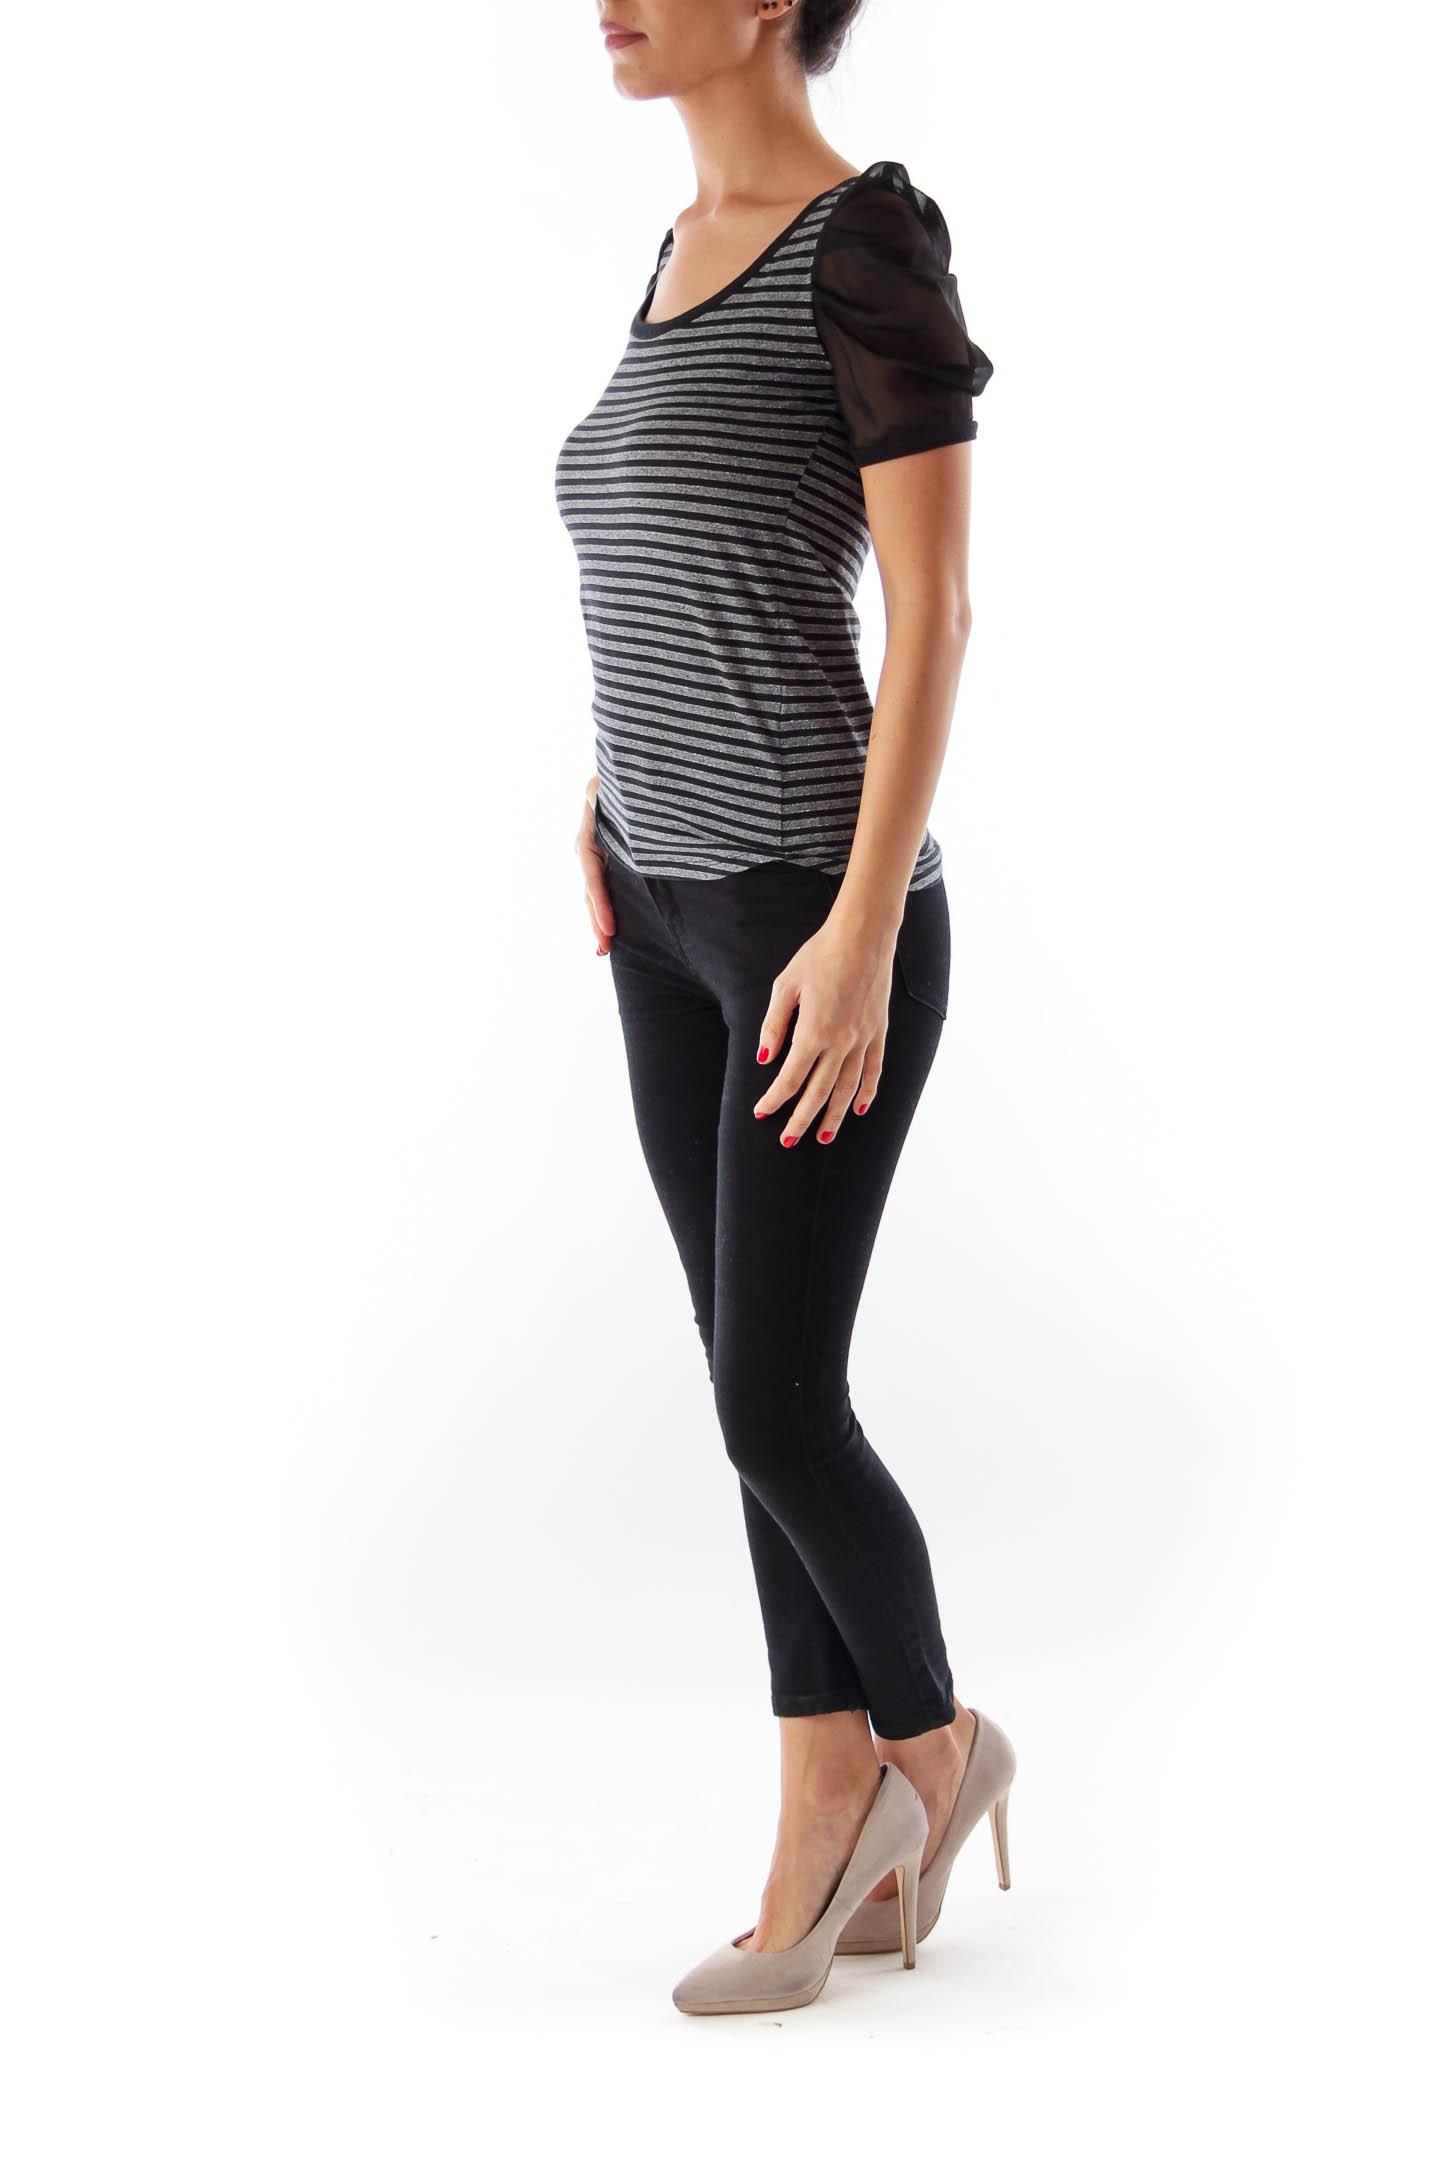 Black & Metallic Stripe Top